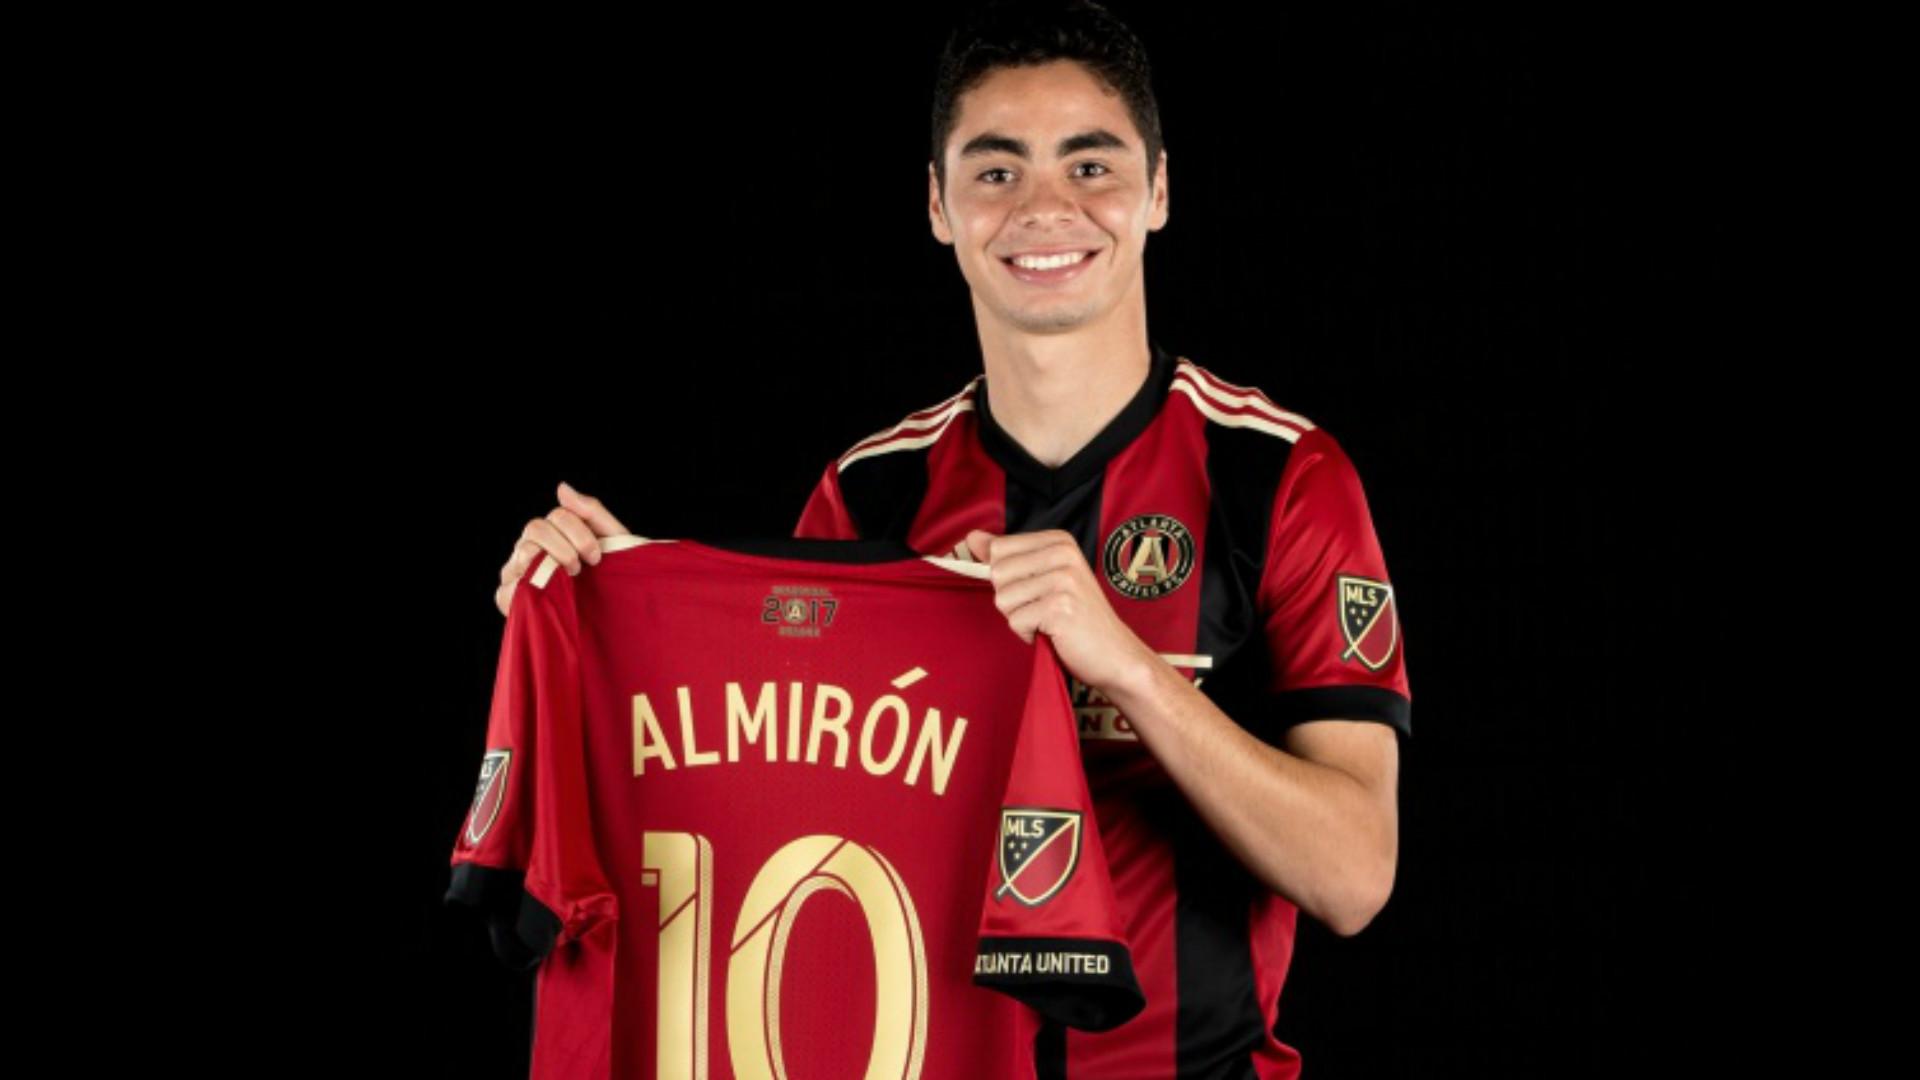 Miguel-almiron-atlanta-united-signing_kt47iuyyij2u1crta4p4337lf